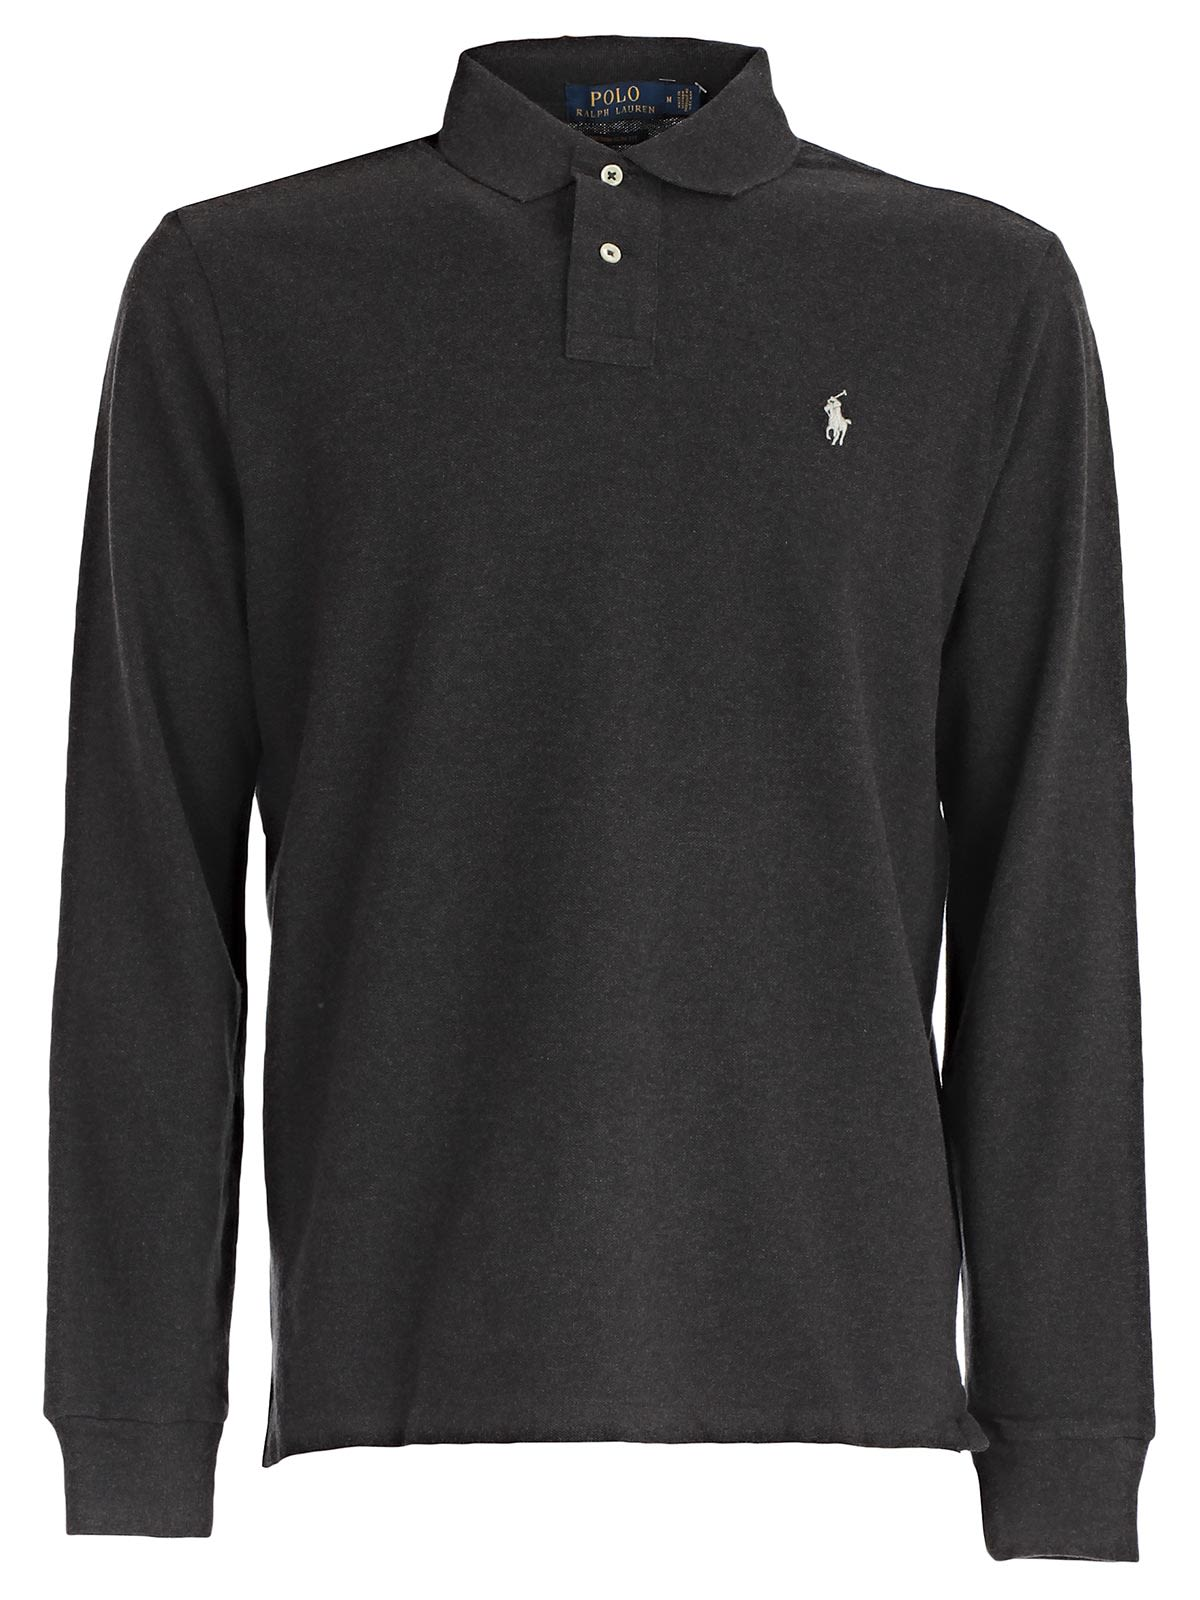 Polo Ralph Lauren Embroidered Long Sleeve Polo Shirt